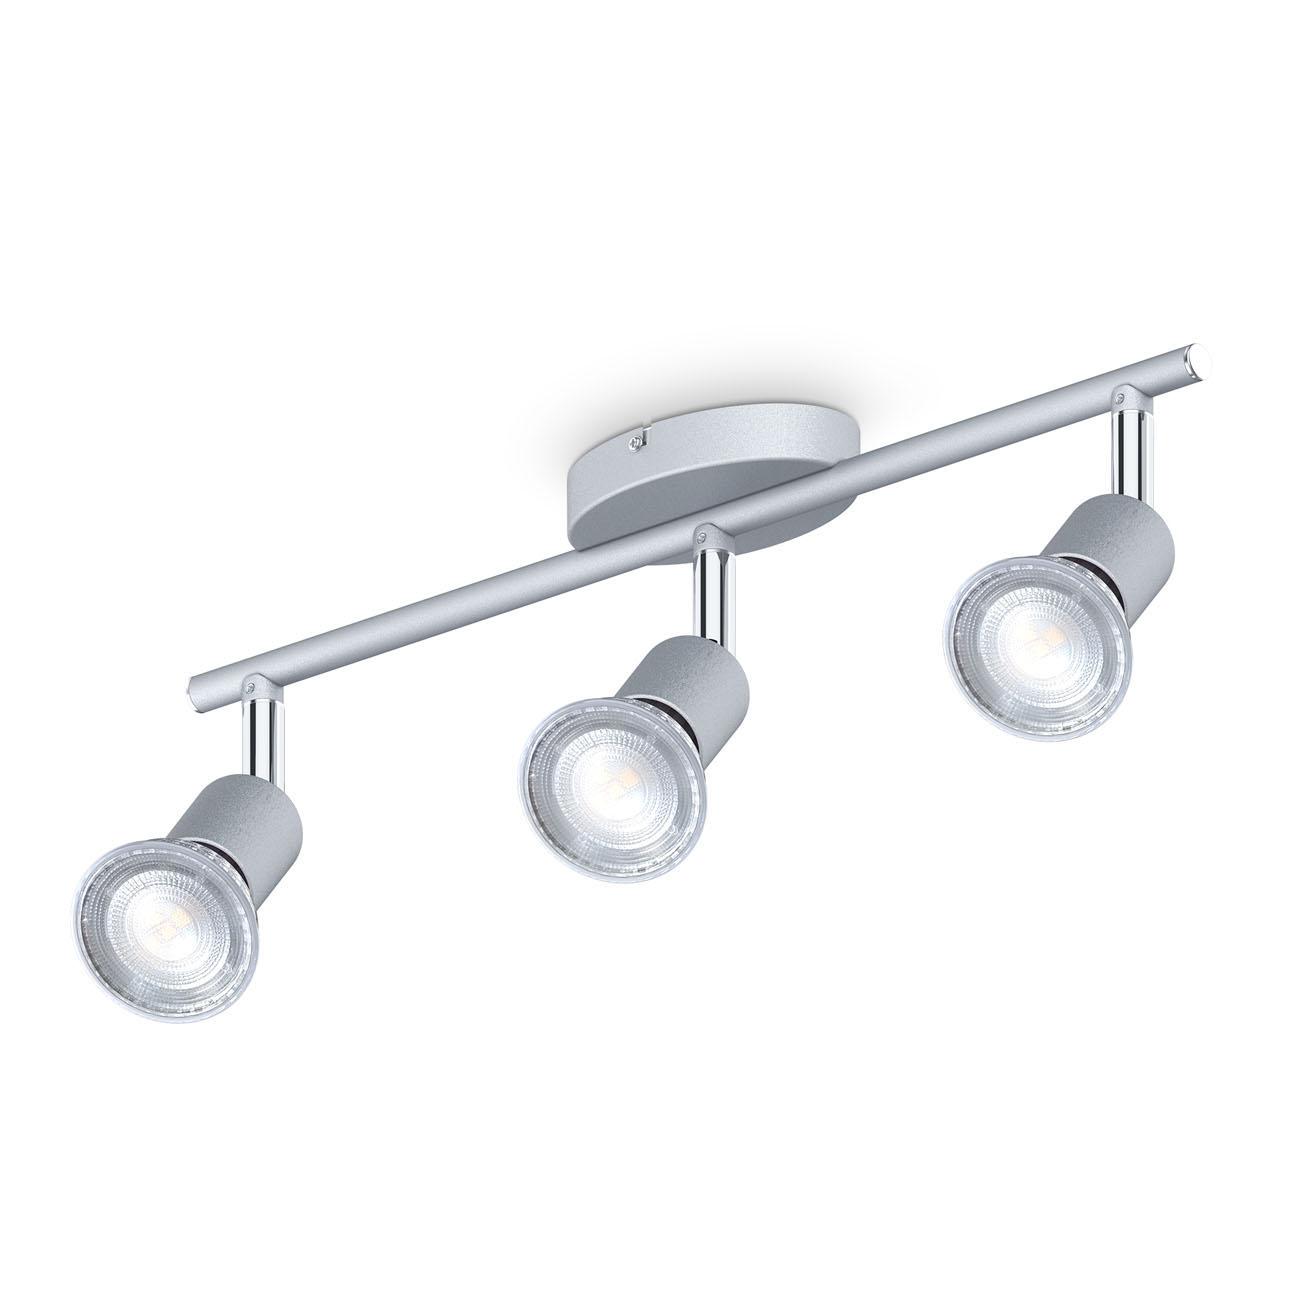 LED Deckenstrahler Spotleucht 3-flammig GU10 titan